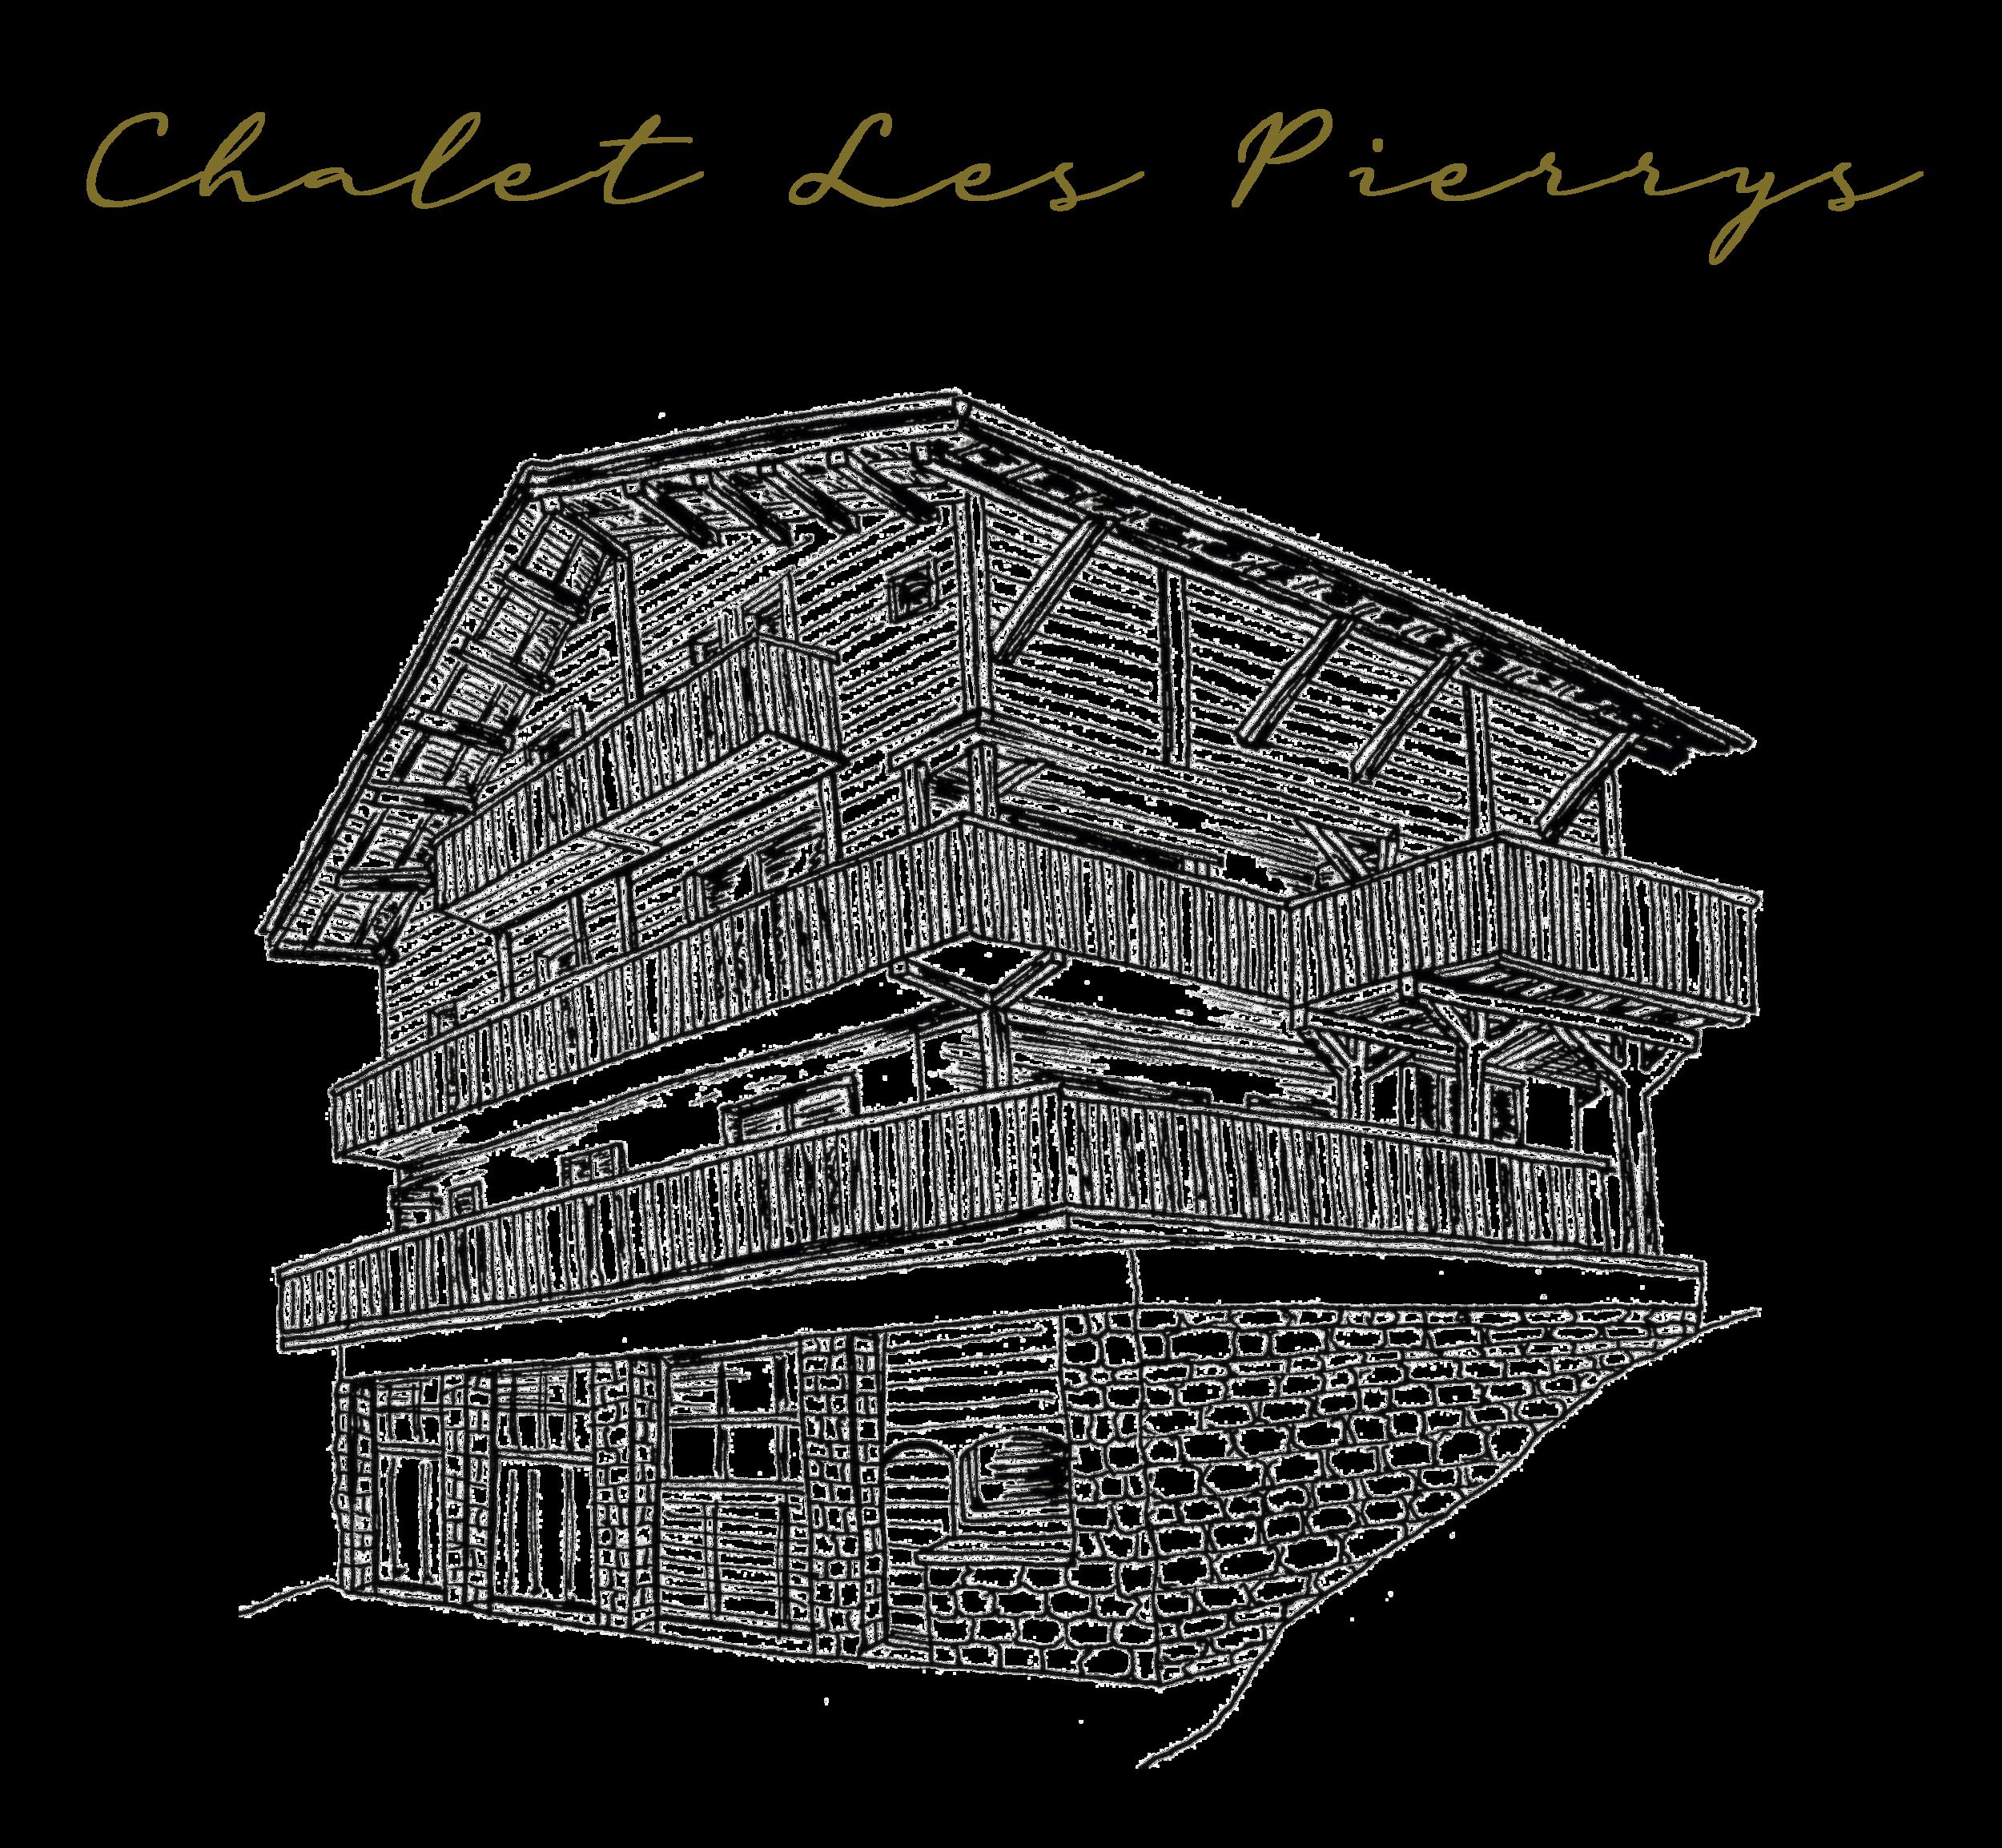 luxury-ski-chalet-les-pierrys-tgski-morzine.png